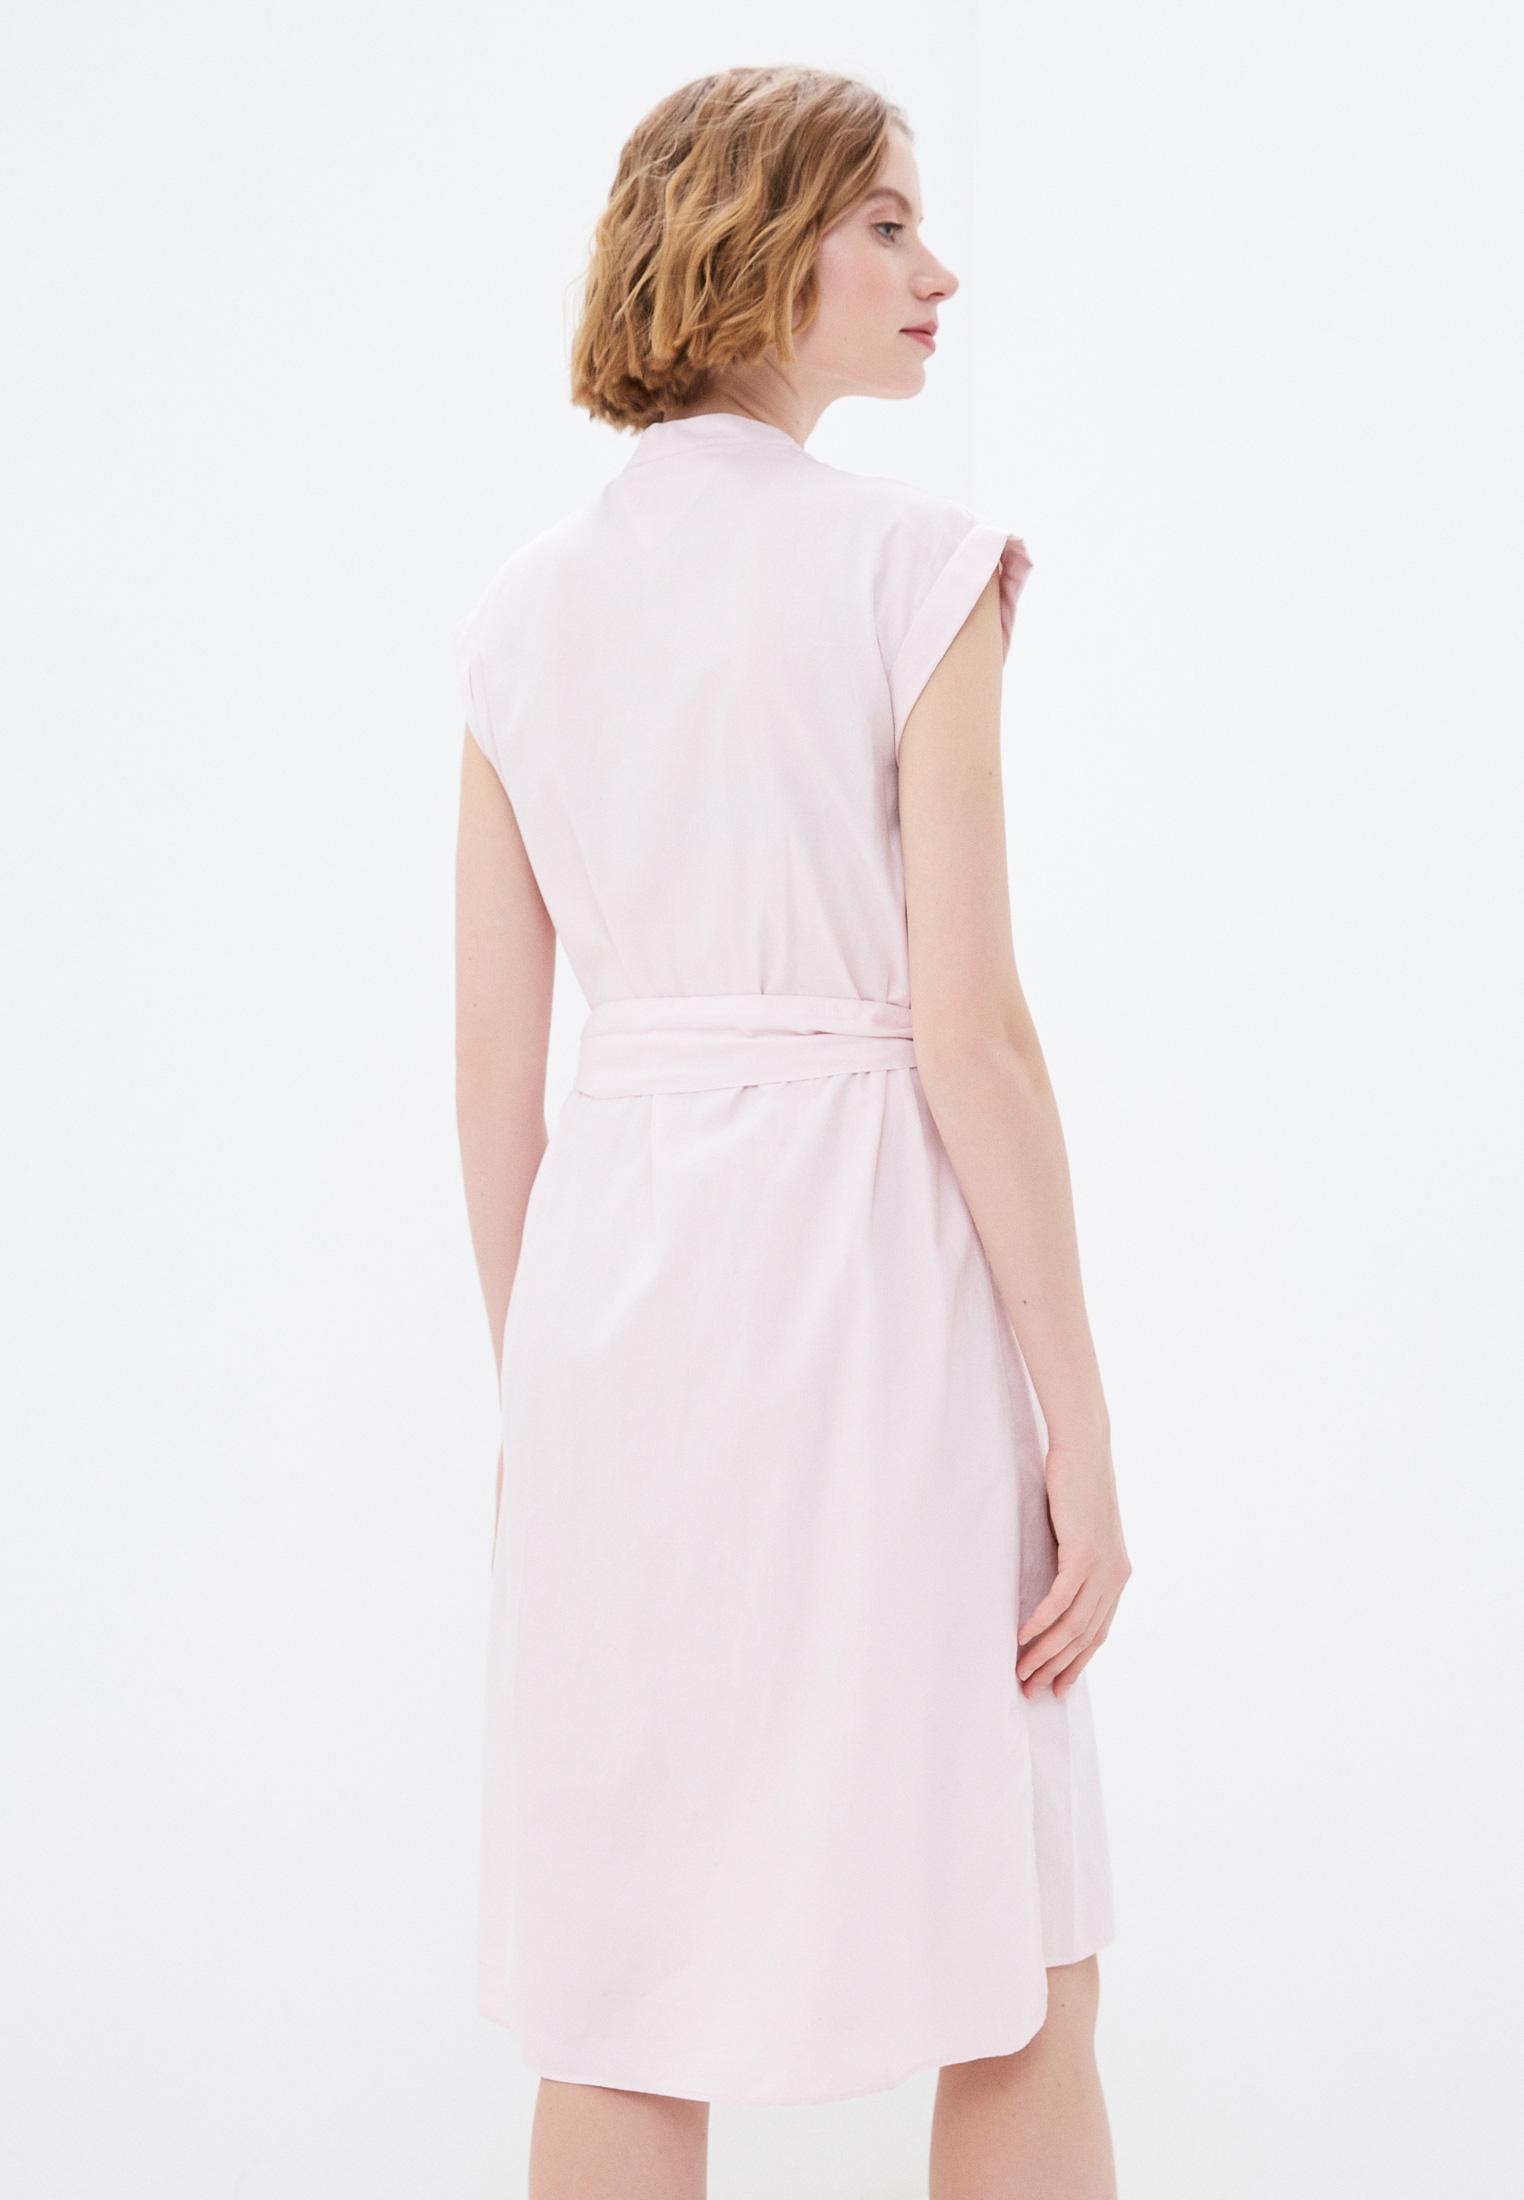 Платье Tommy Hilfiger (Томми Хилфигер) WW0WW30596: изображение 3